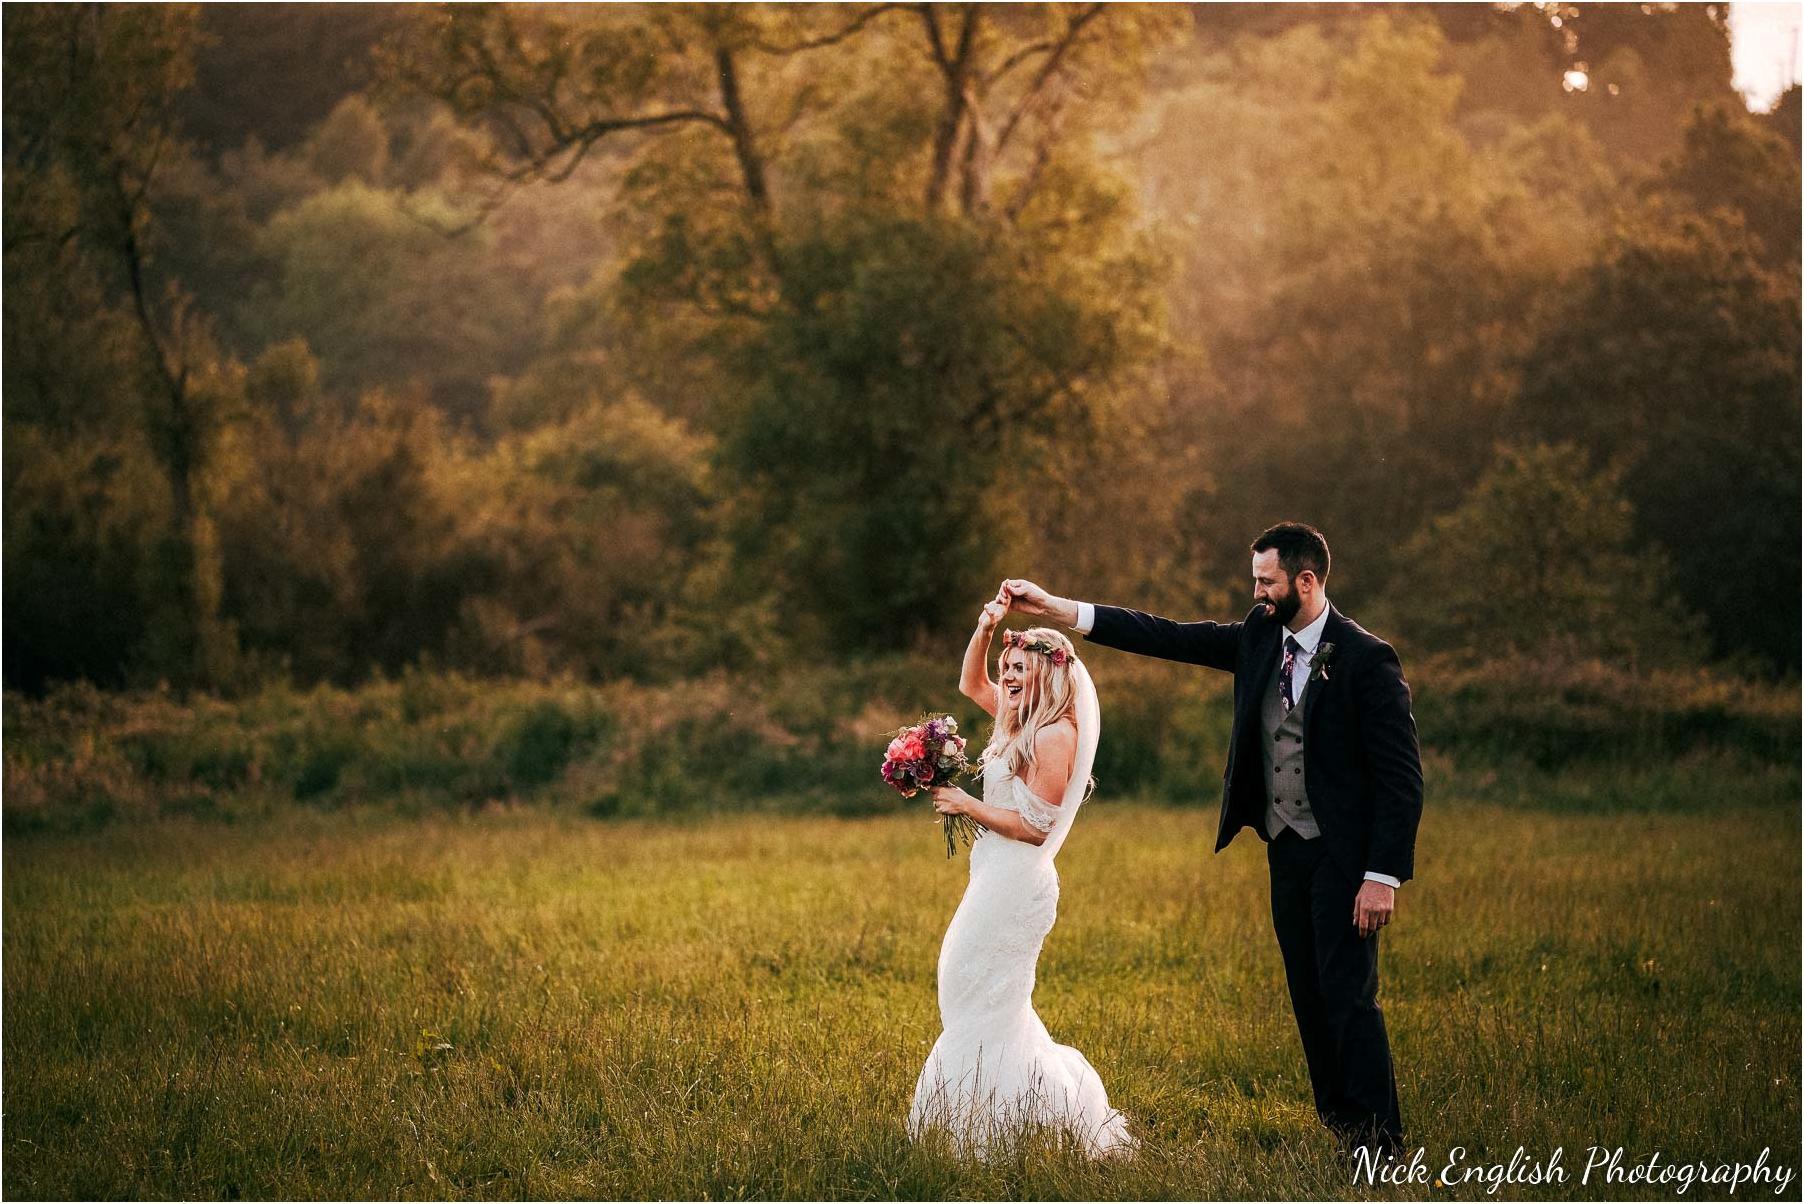 Whitebottom_Farm_Wedding_Manchester_Photograph-104.jpg